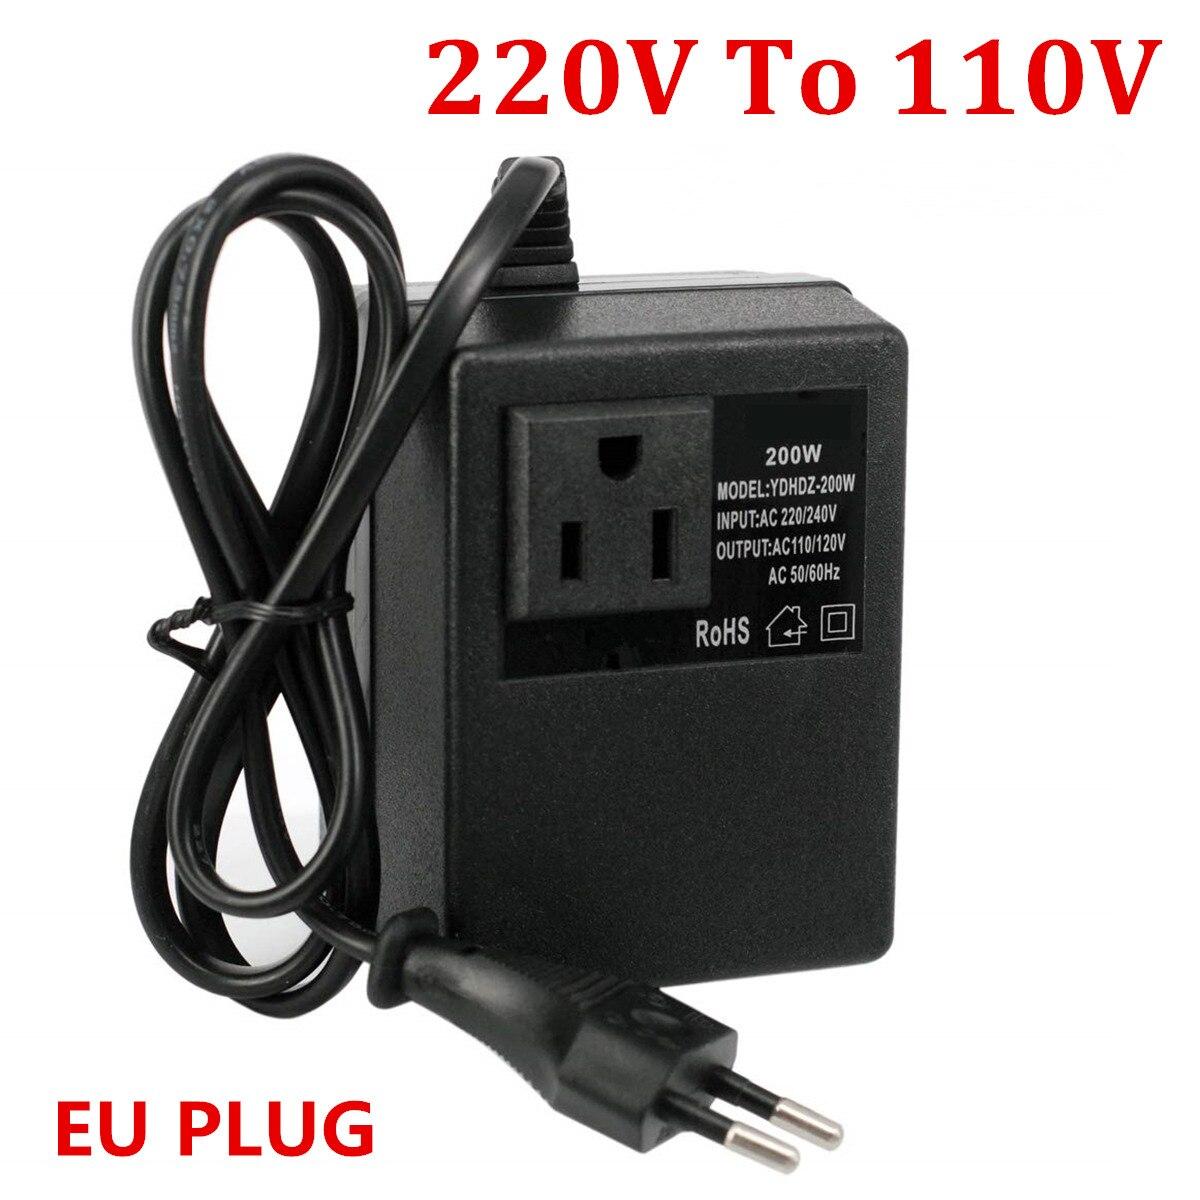 NEUE 1 PCS 200W Spannung Konverter Transformator 220V Bis 110V Step Down Reise Spannung Transformator Konverter EU stecker